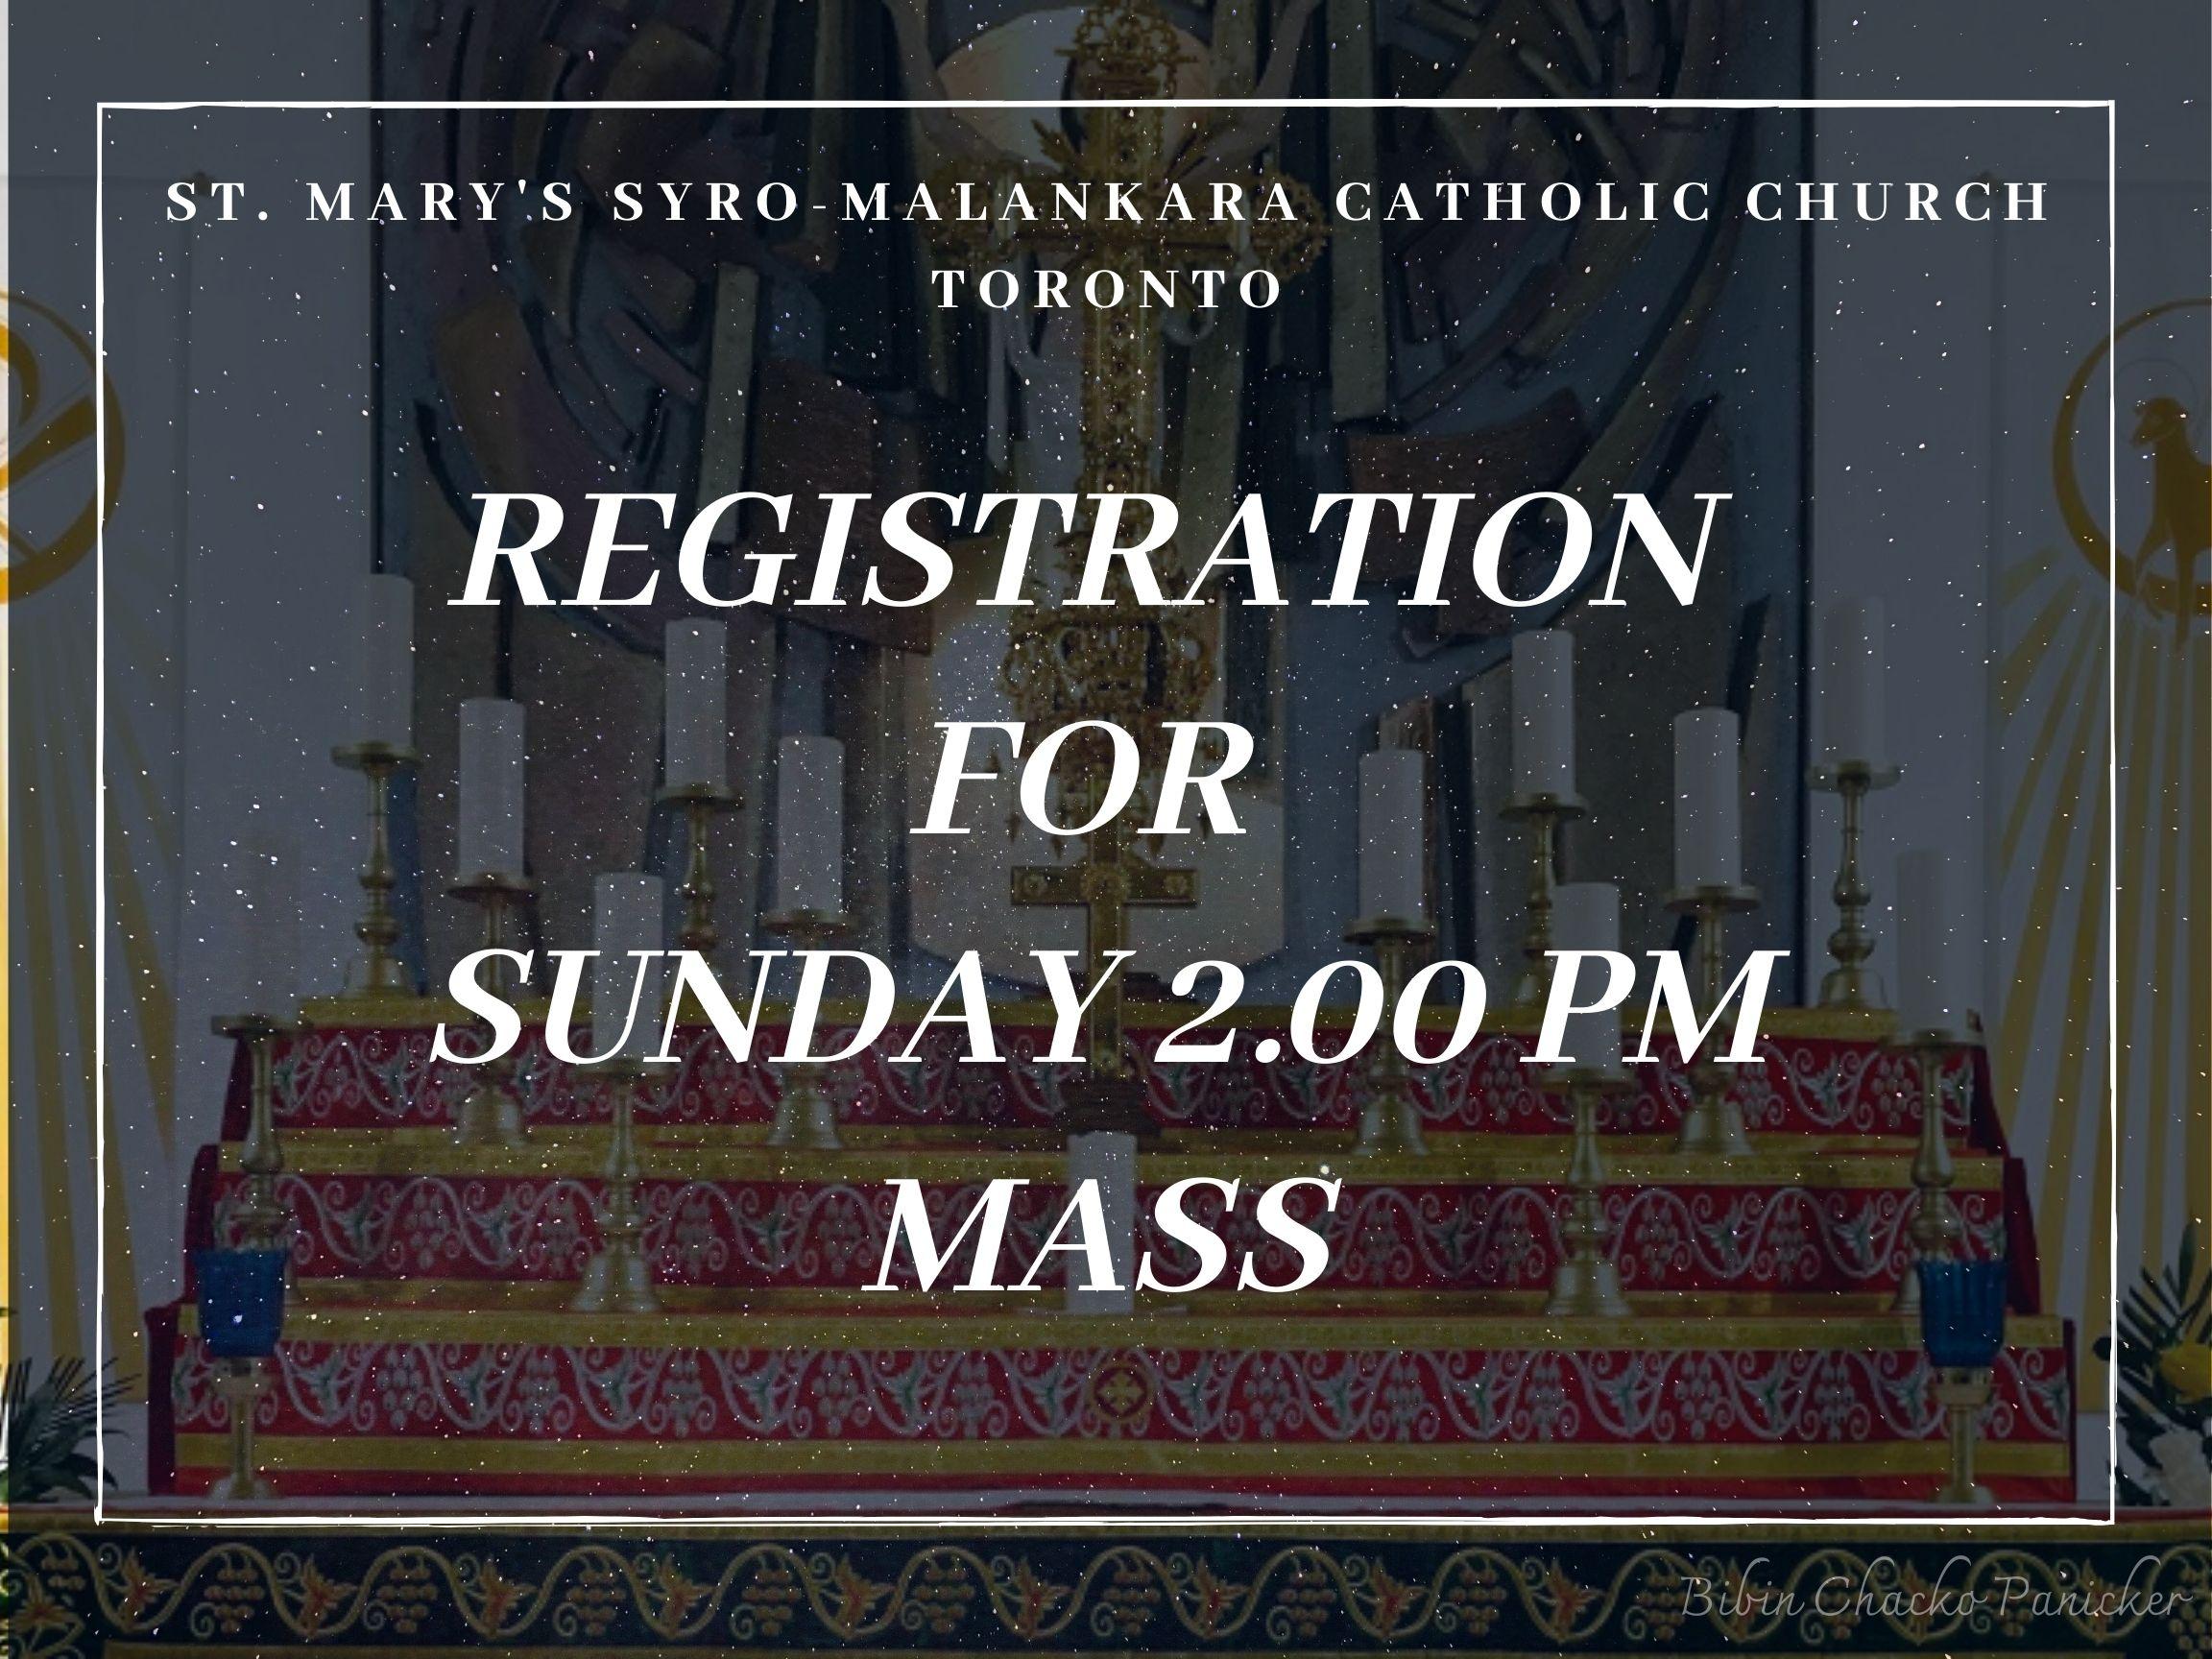 Sunday 2.00pm Mass sign up - St Marys' Syro-Malankara Catholic Church, Toronto